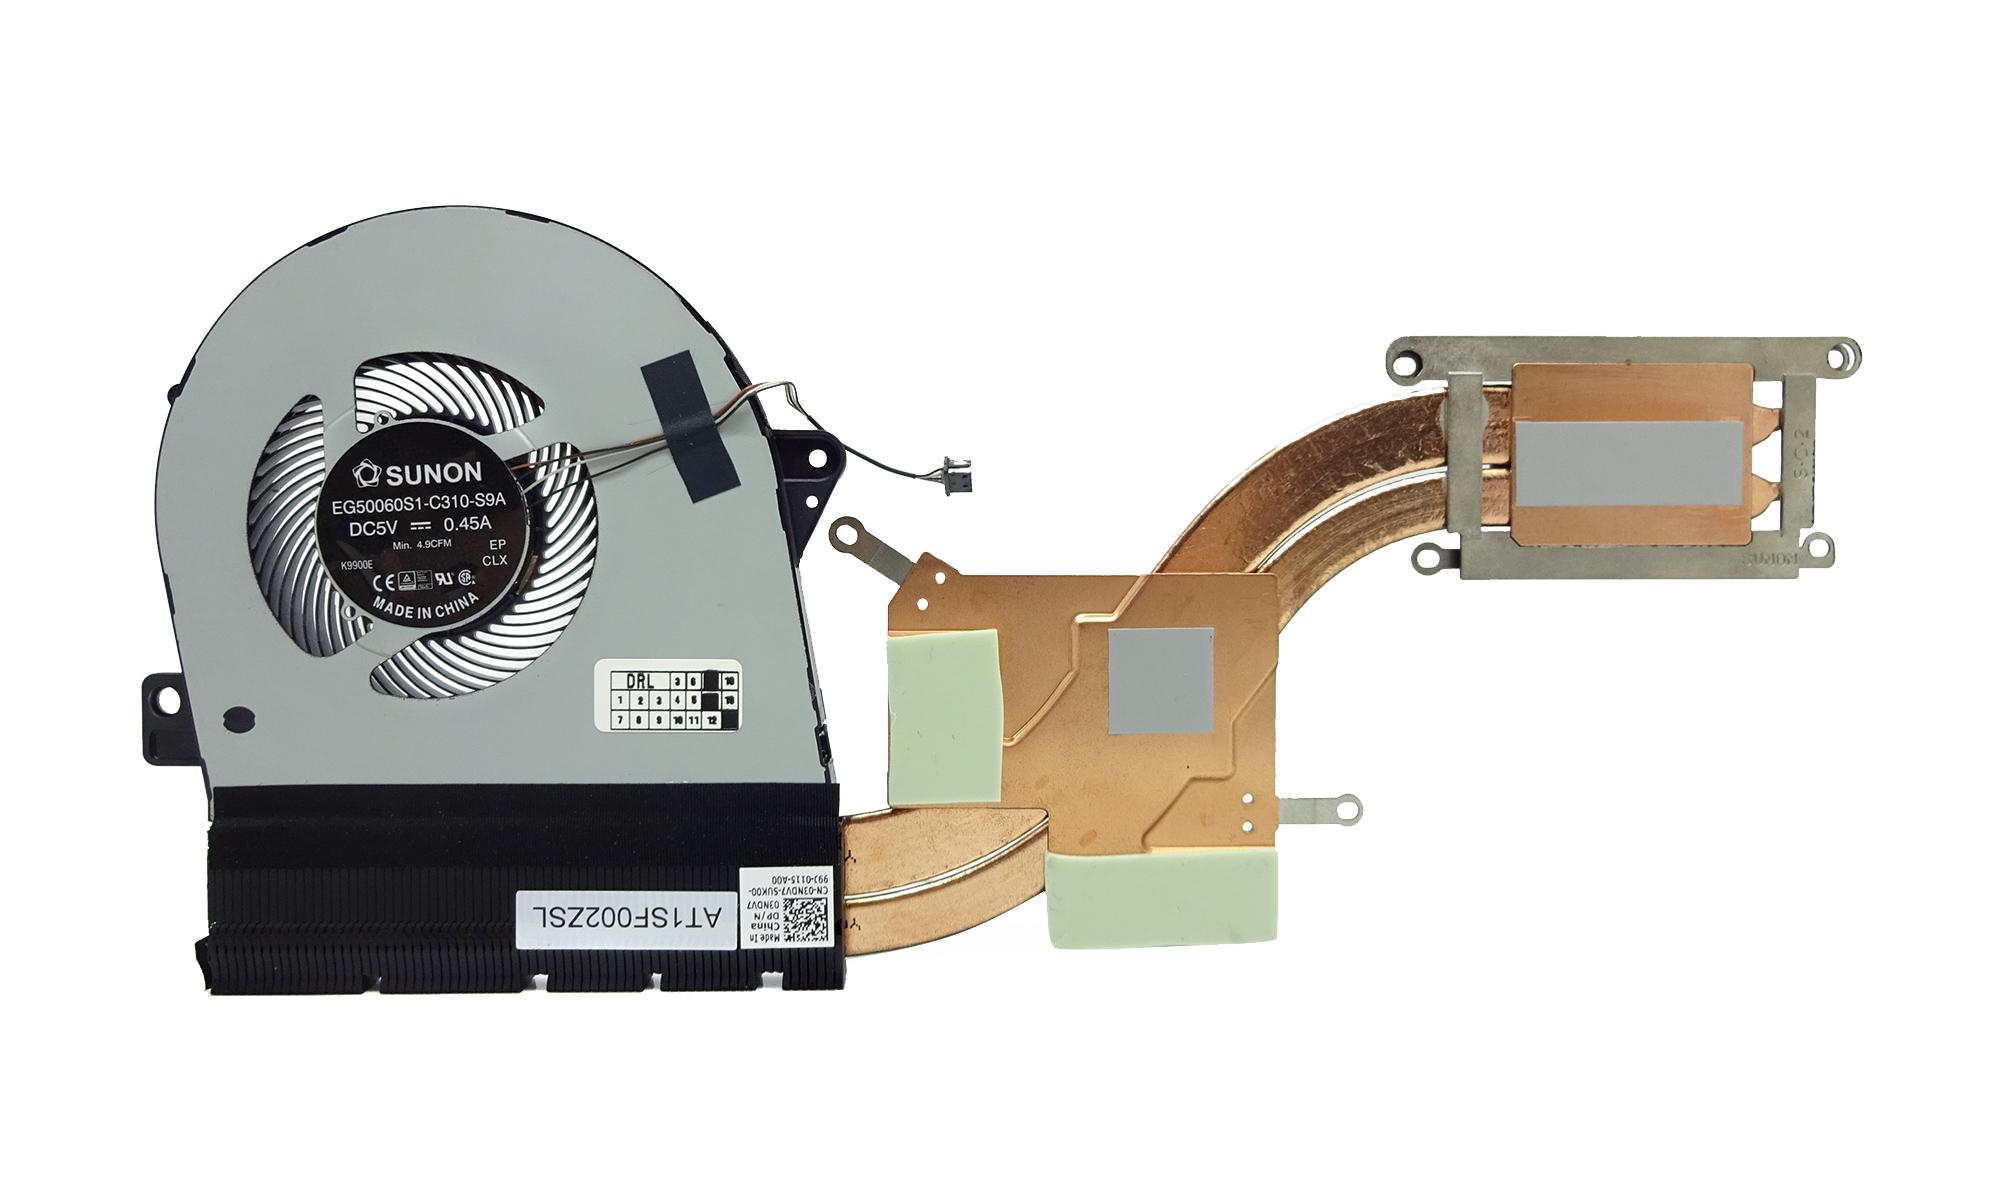 Sistem racire original laptop Dell Latitude 5580, 5591, Precision 3520, 3530 echipate cu procesor Intel seria H (performante ridicate) si placa video dedicata Nvidia, model 3NDV7